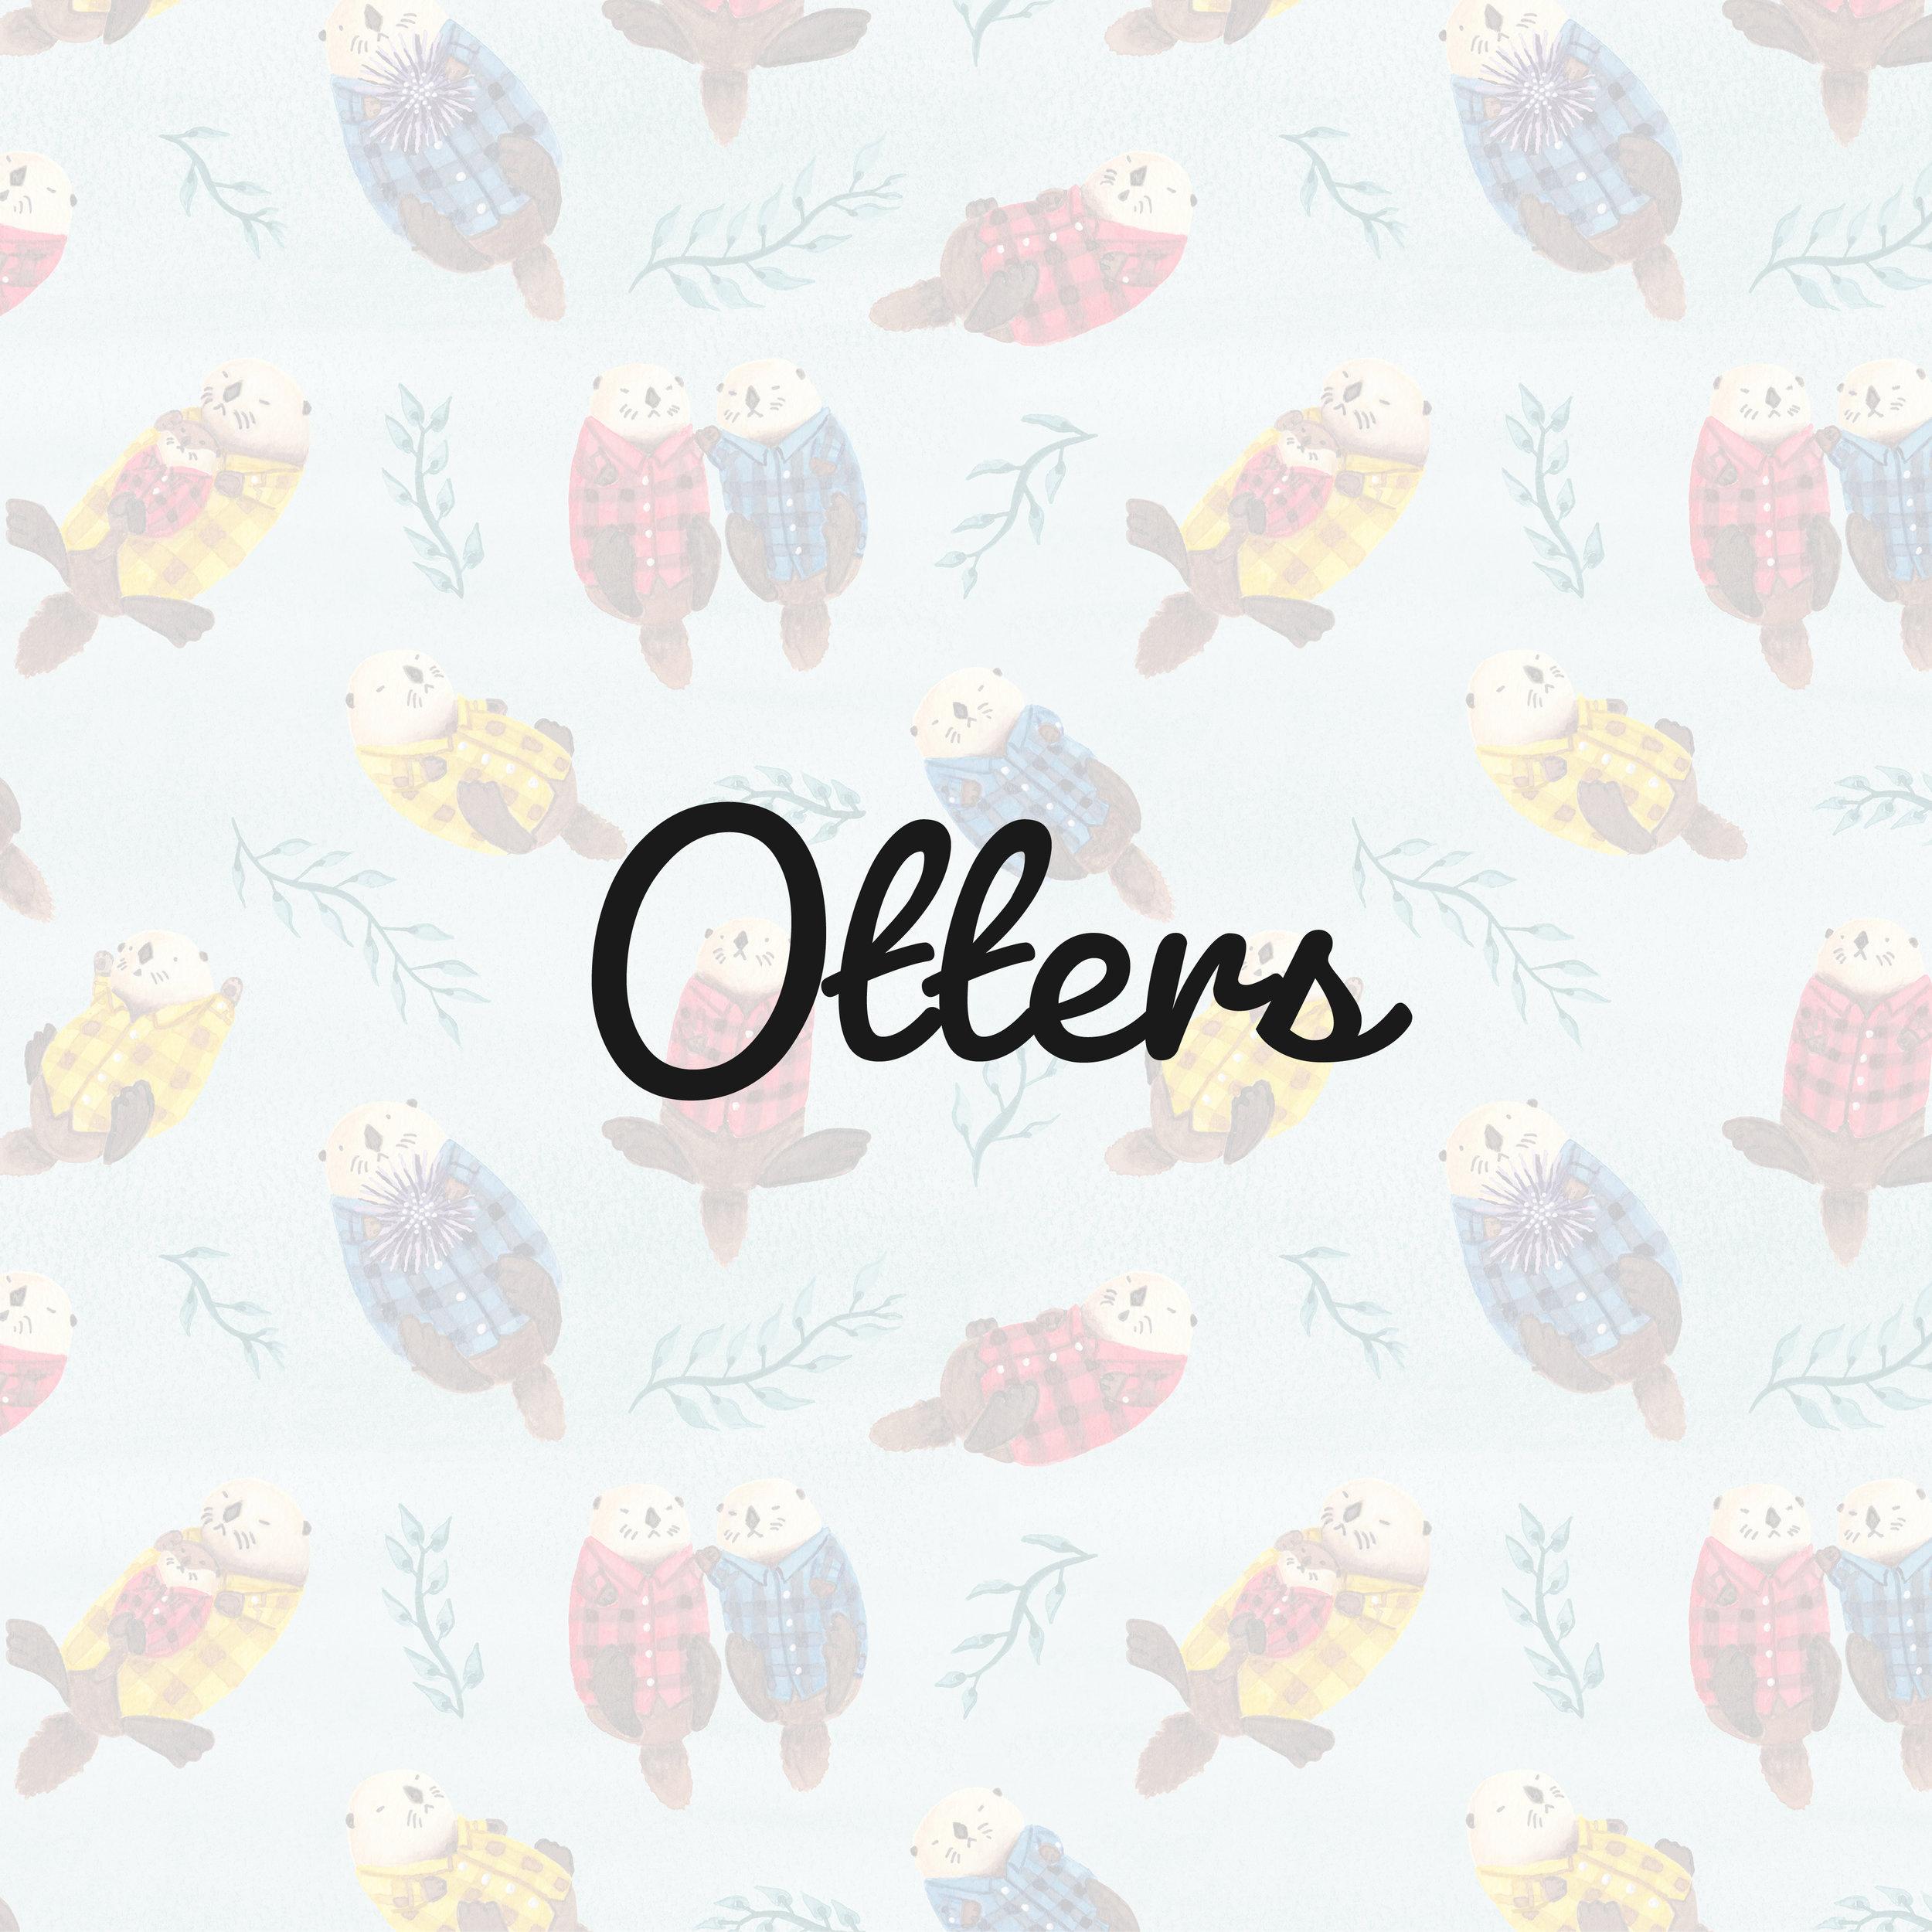 Otters_square.jpg